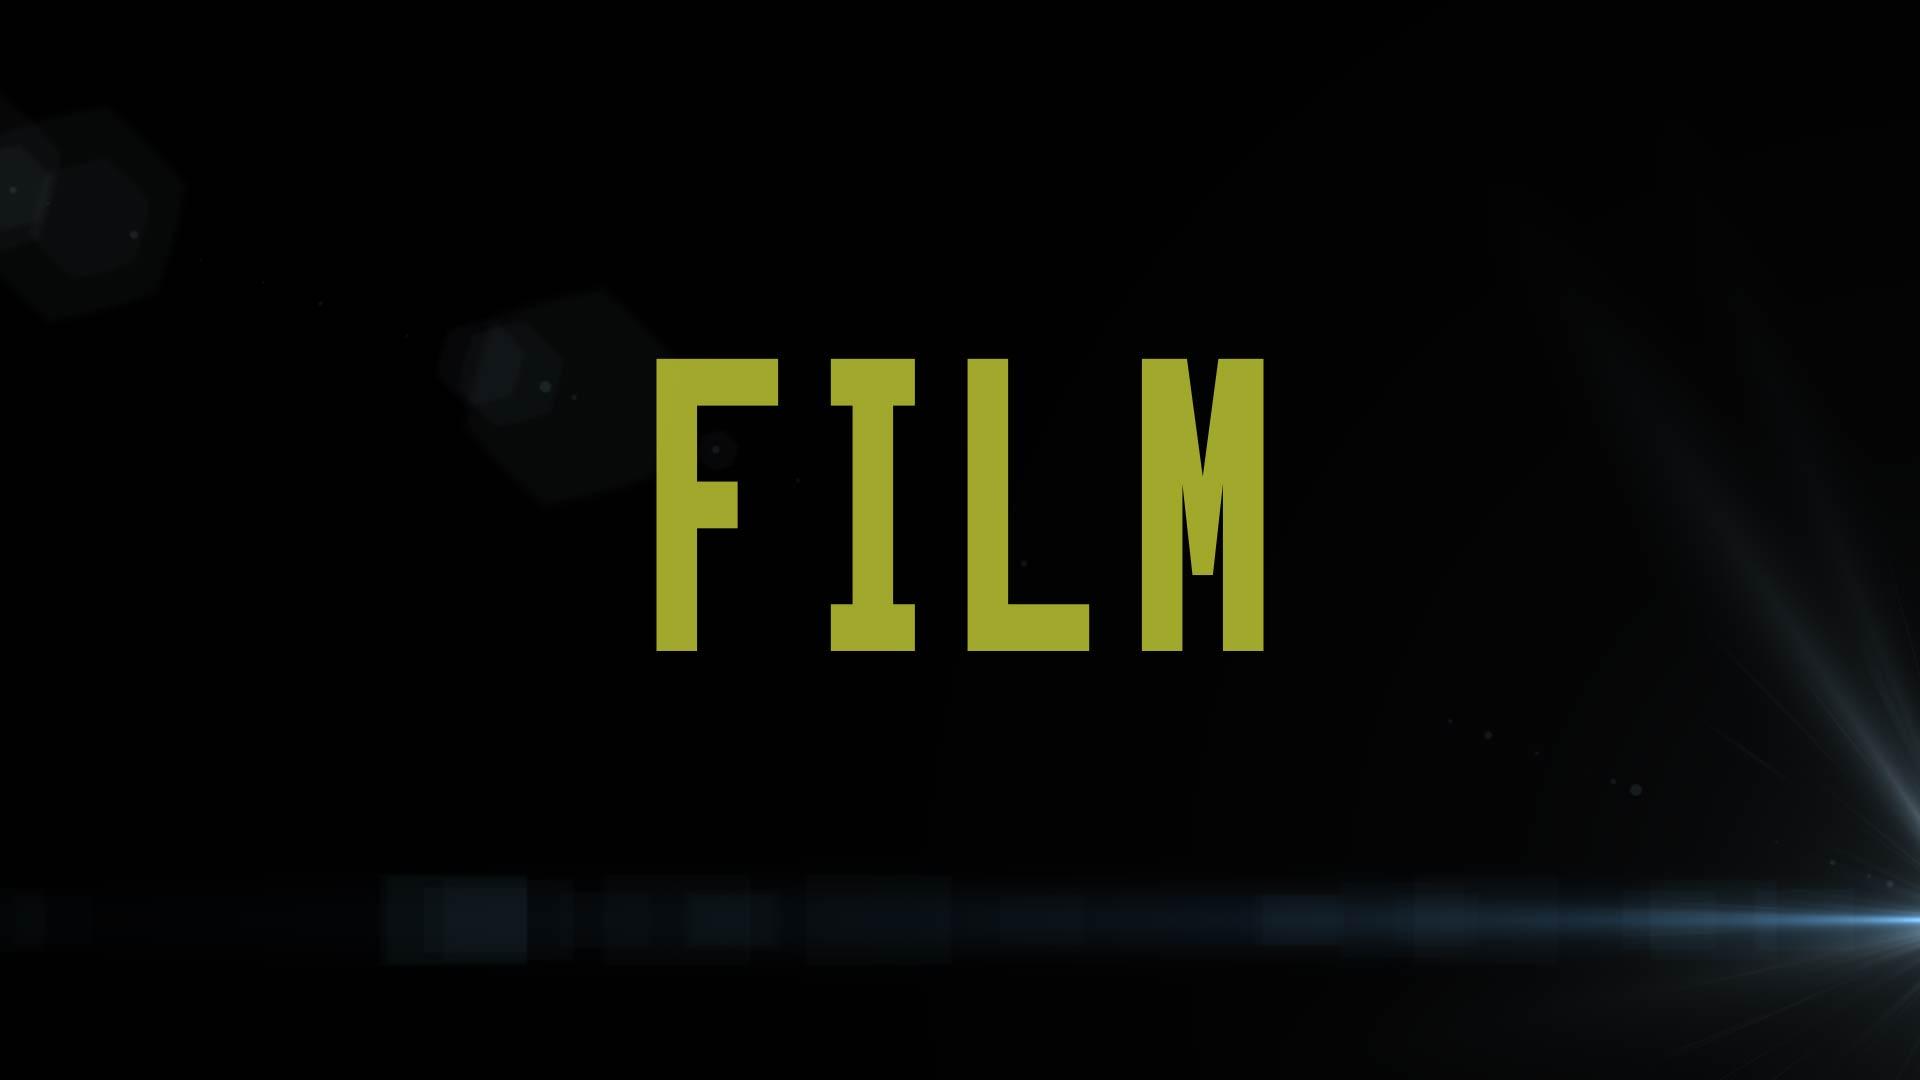 FILM - Gallery Breaker_00000_00000.jpg